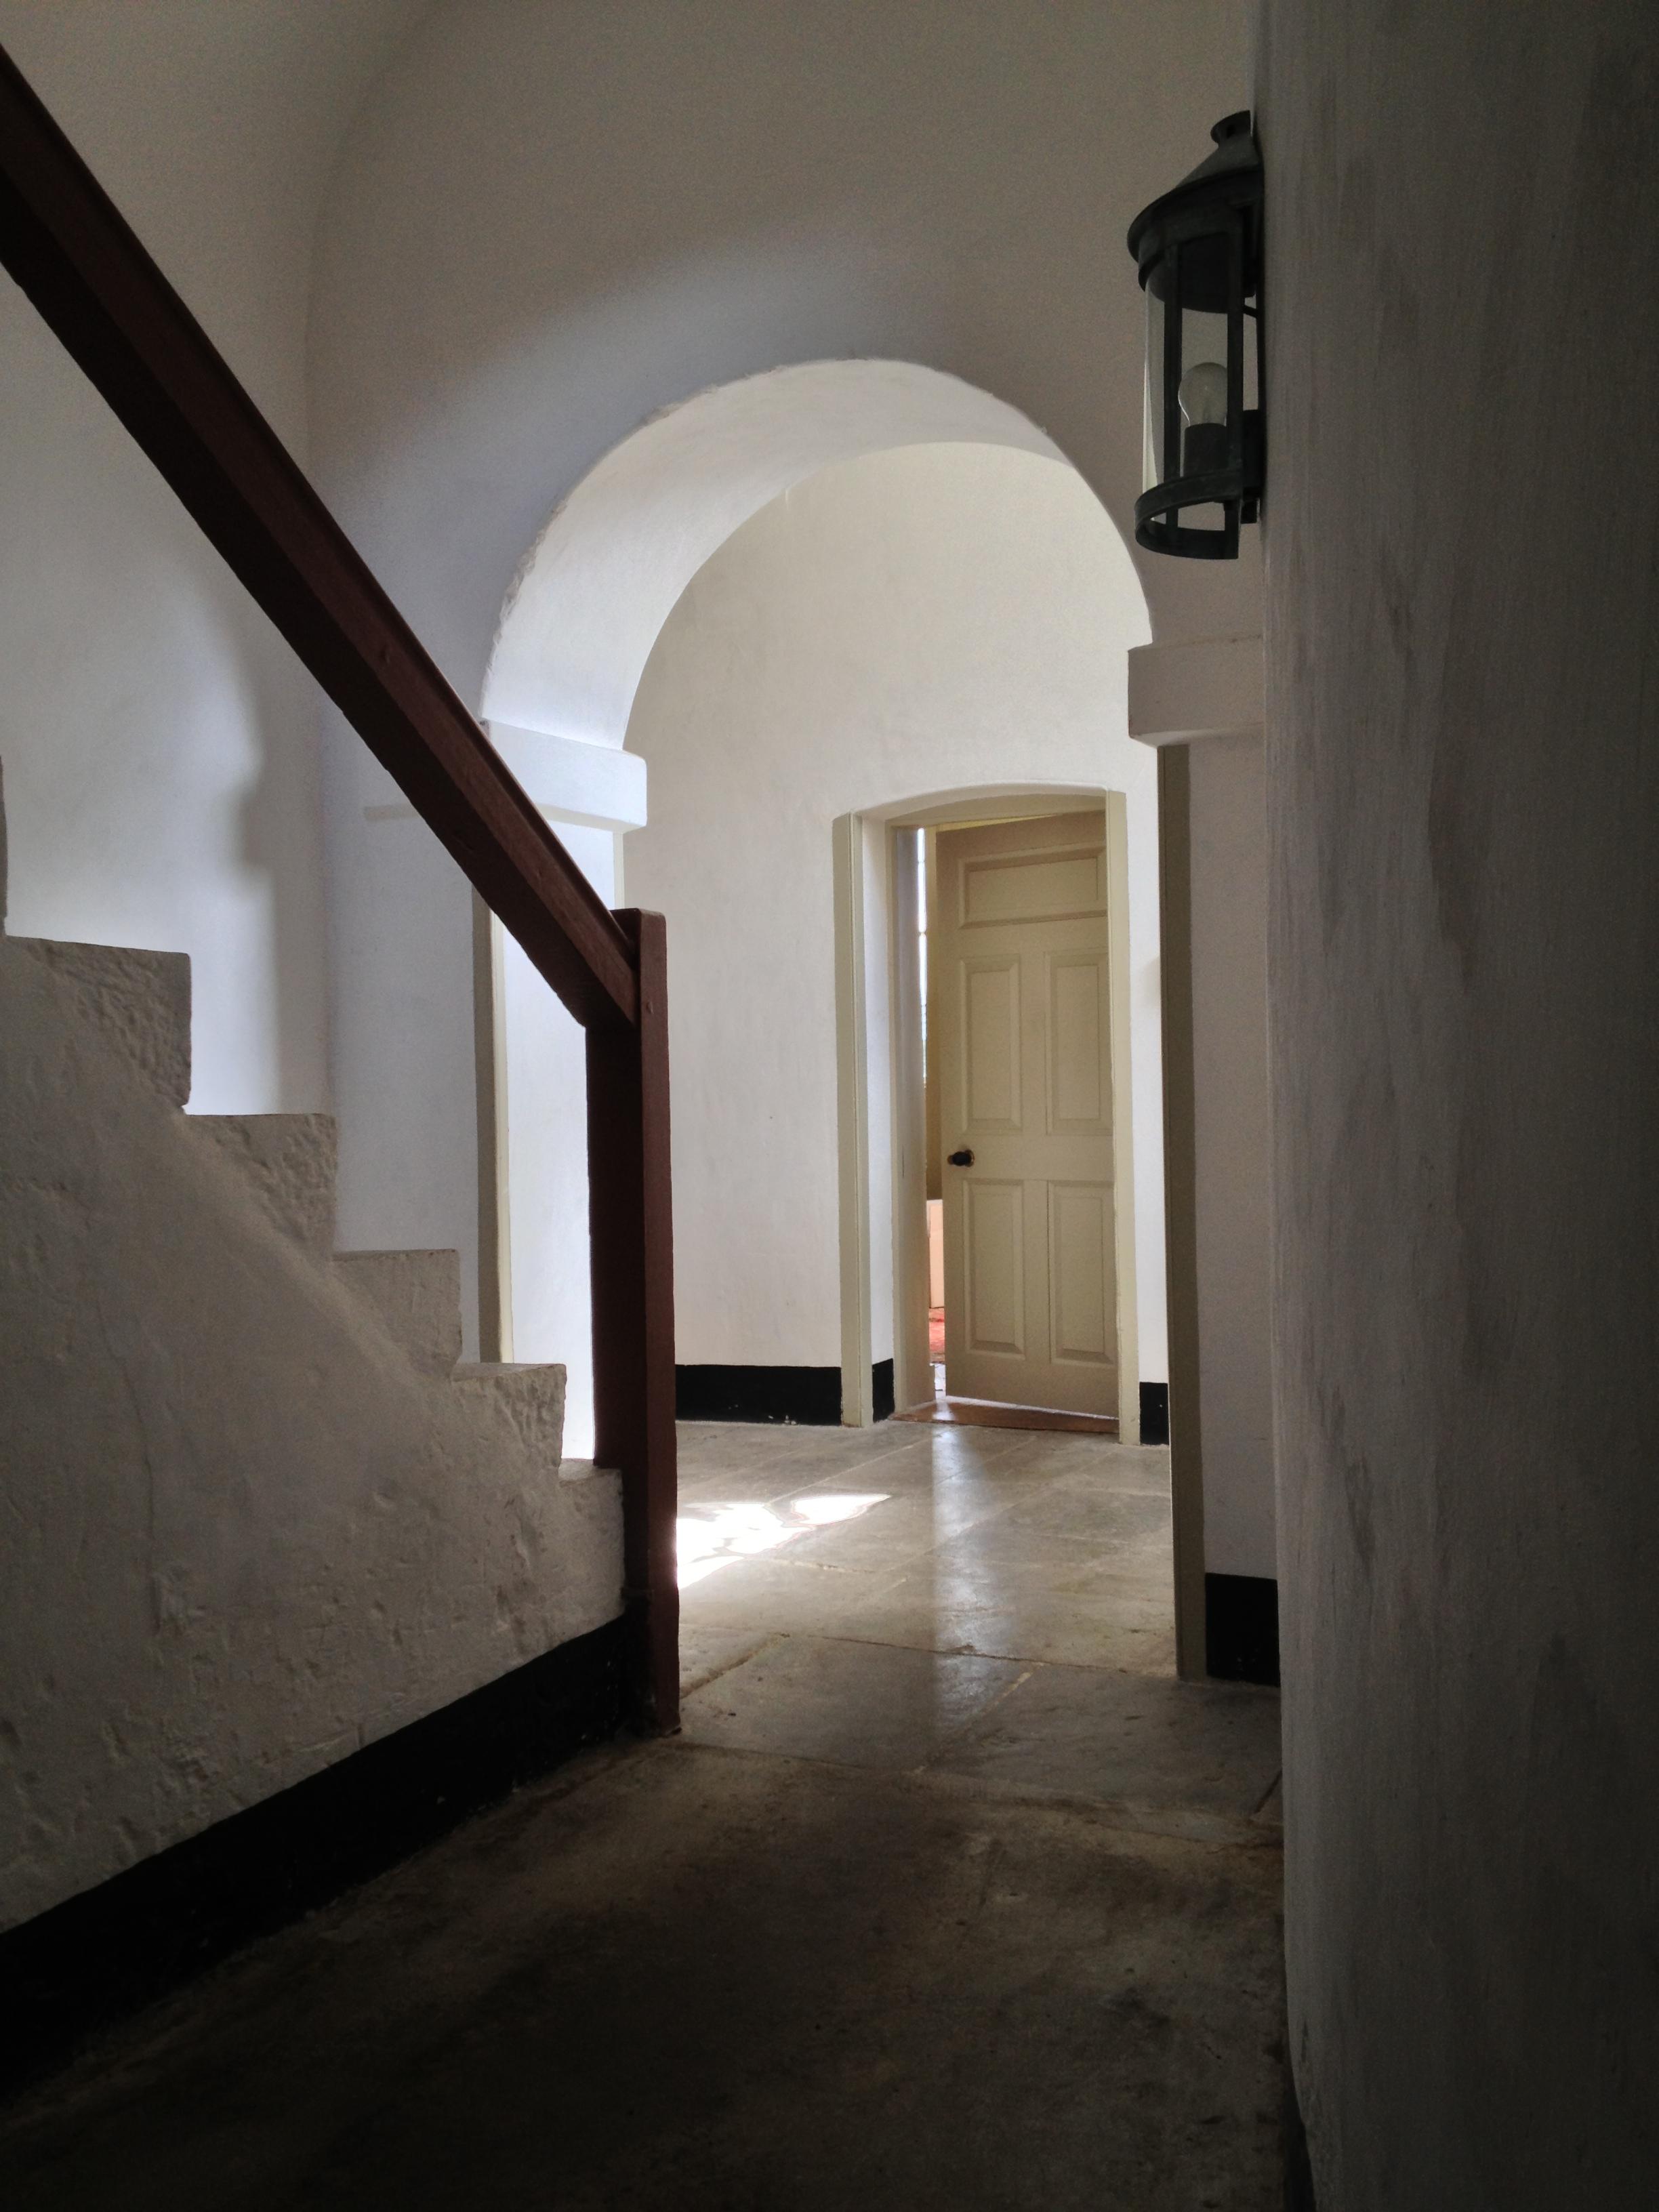 Architect Designed Houses For Sale Ireland  House Design Ideas - Architect designed homes for sale